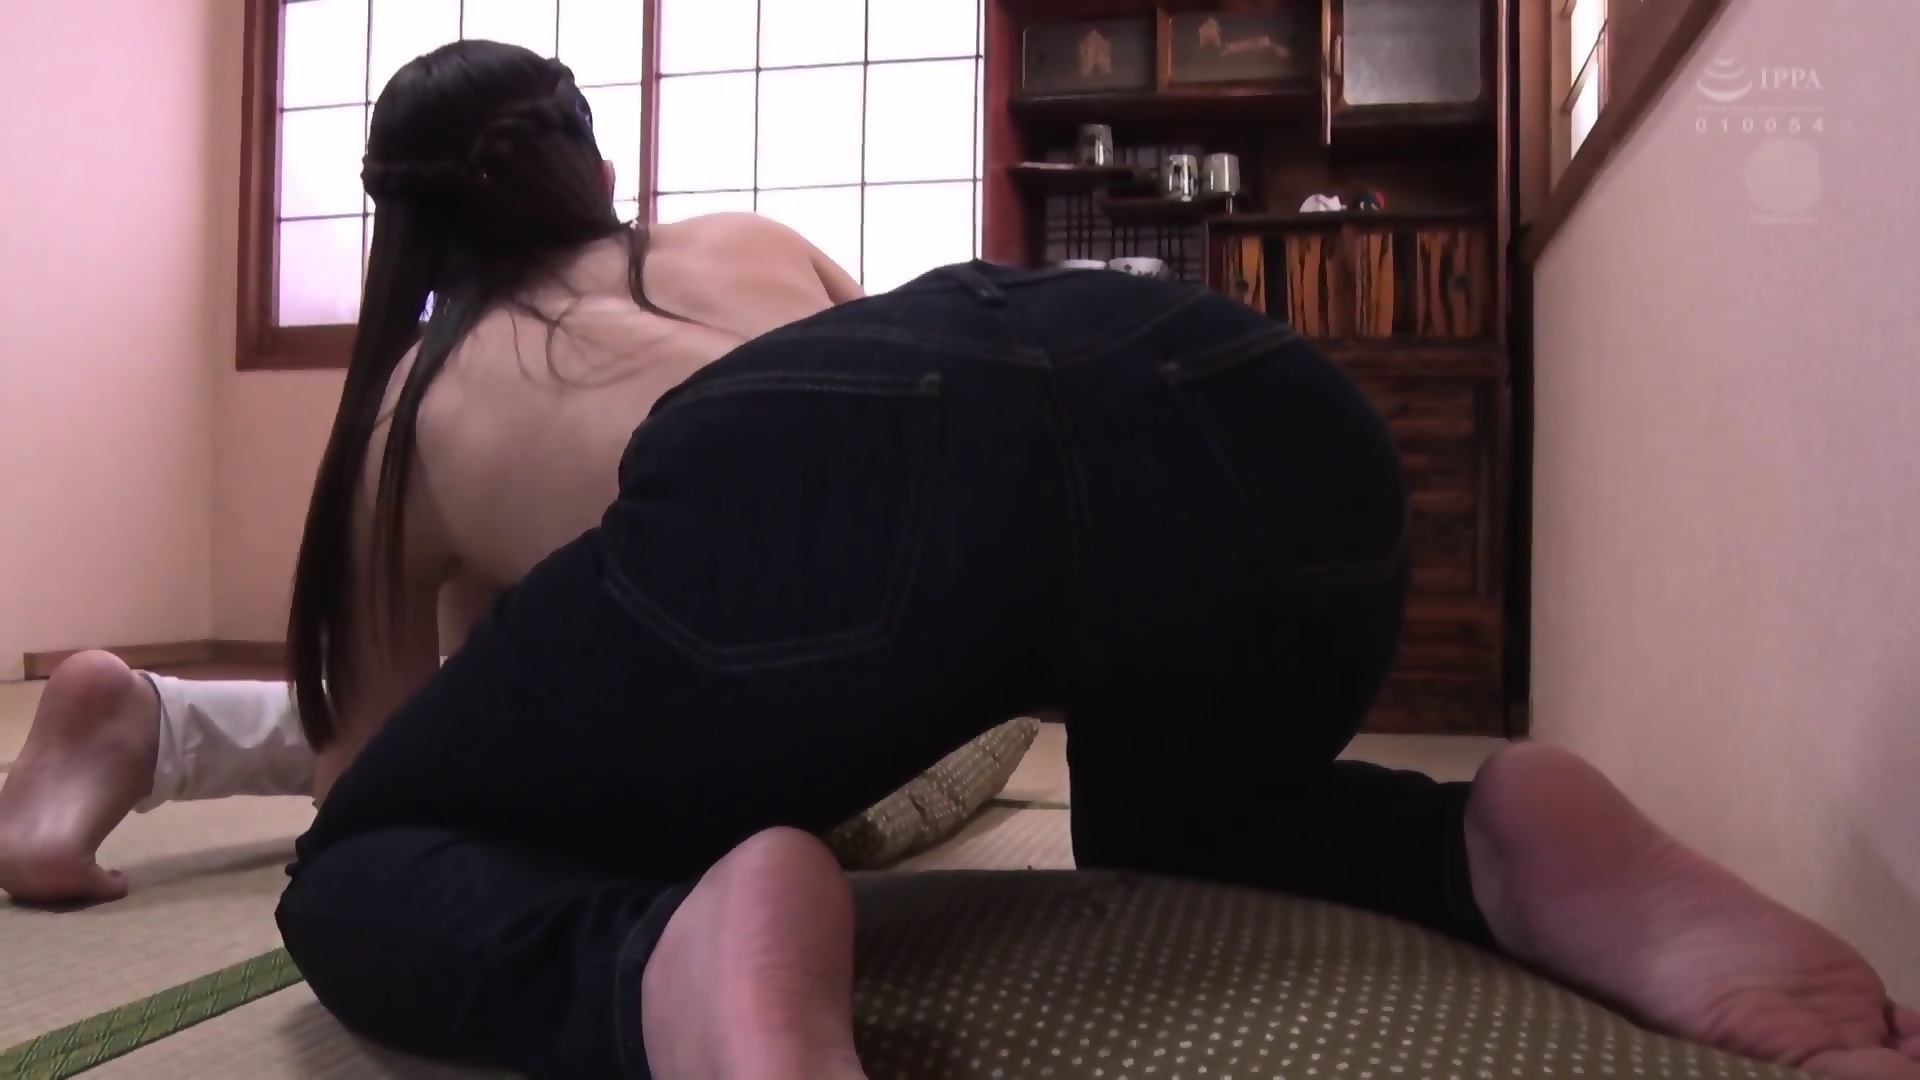 sex video Latina boobs free gallery